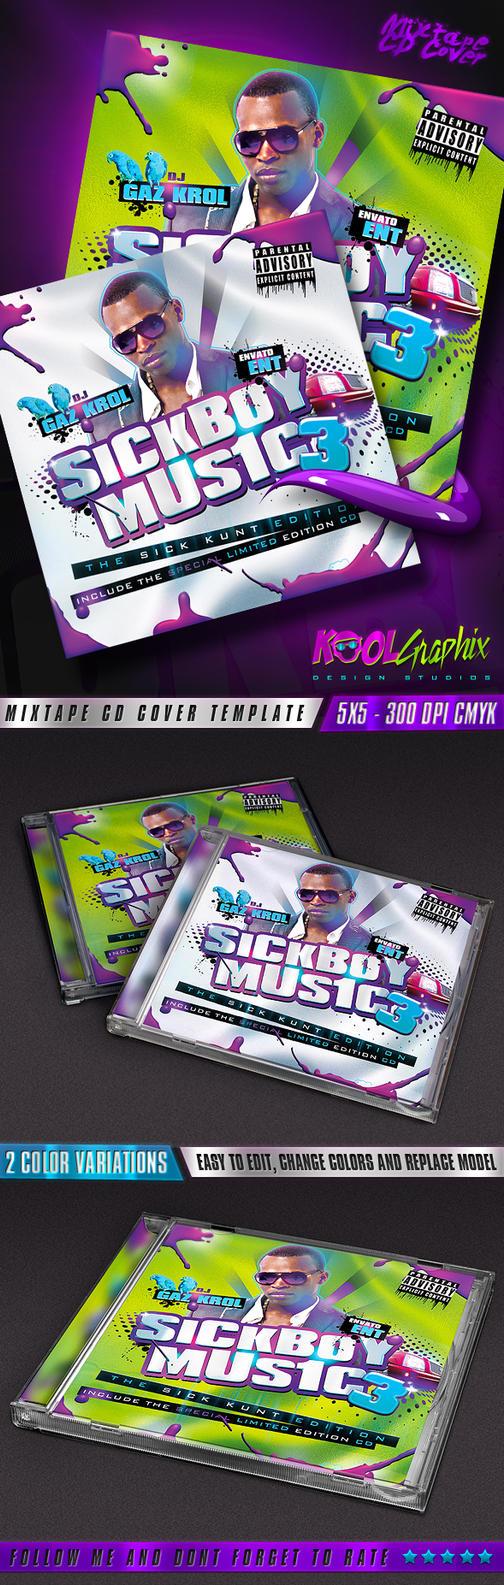 SickBoy Music - Mixtape CD Cover by KoolGfx